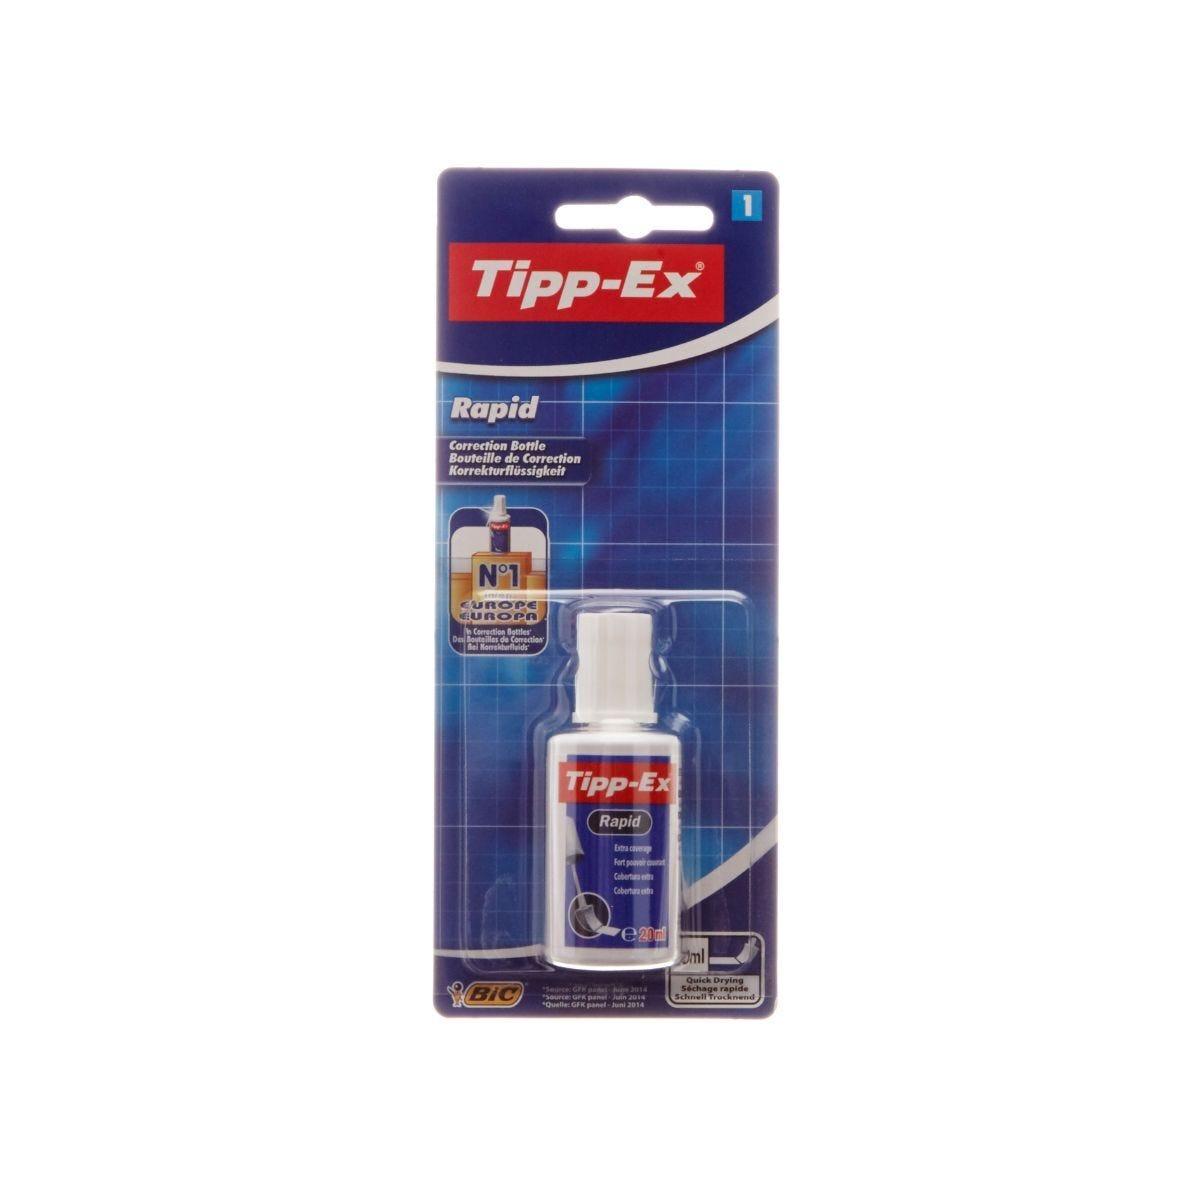 Tippex Rapid Correction Fluid Foam Applicator 20ml